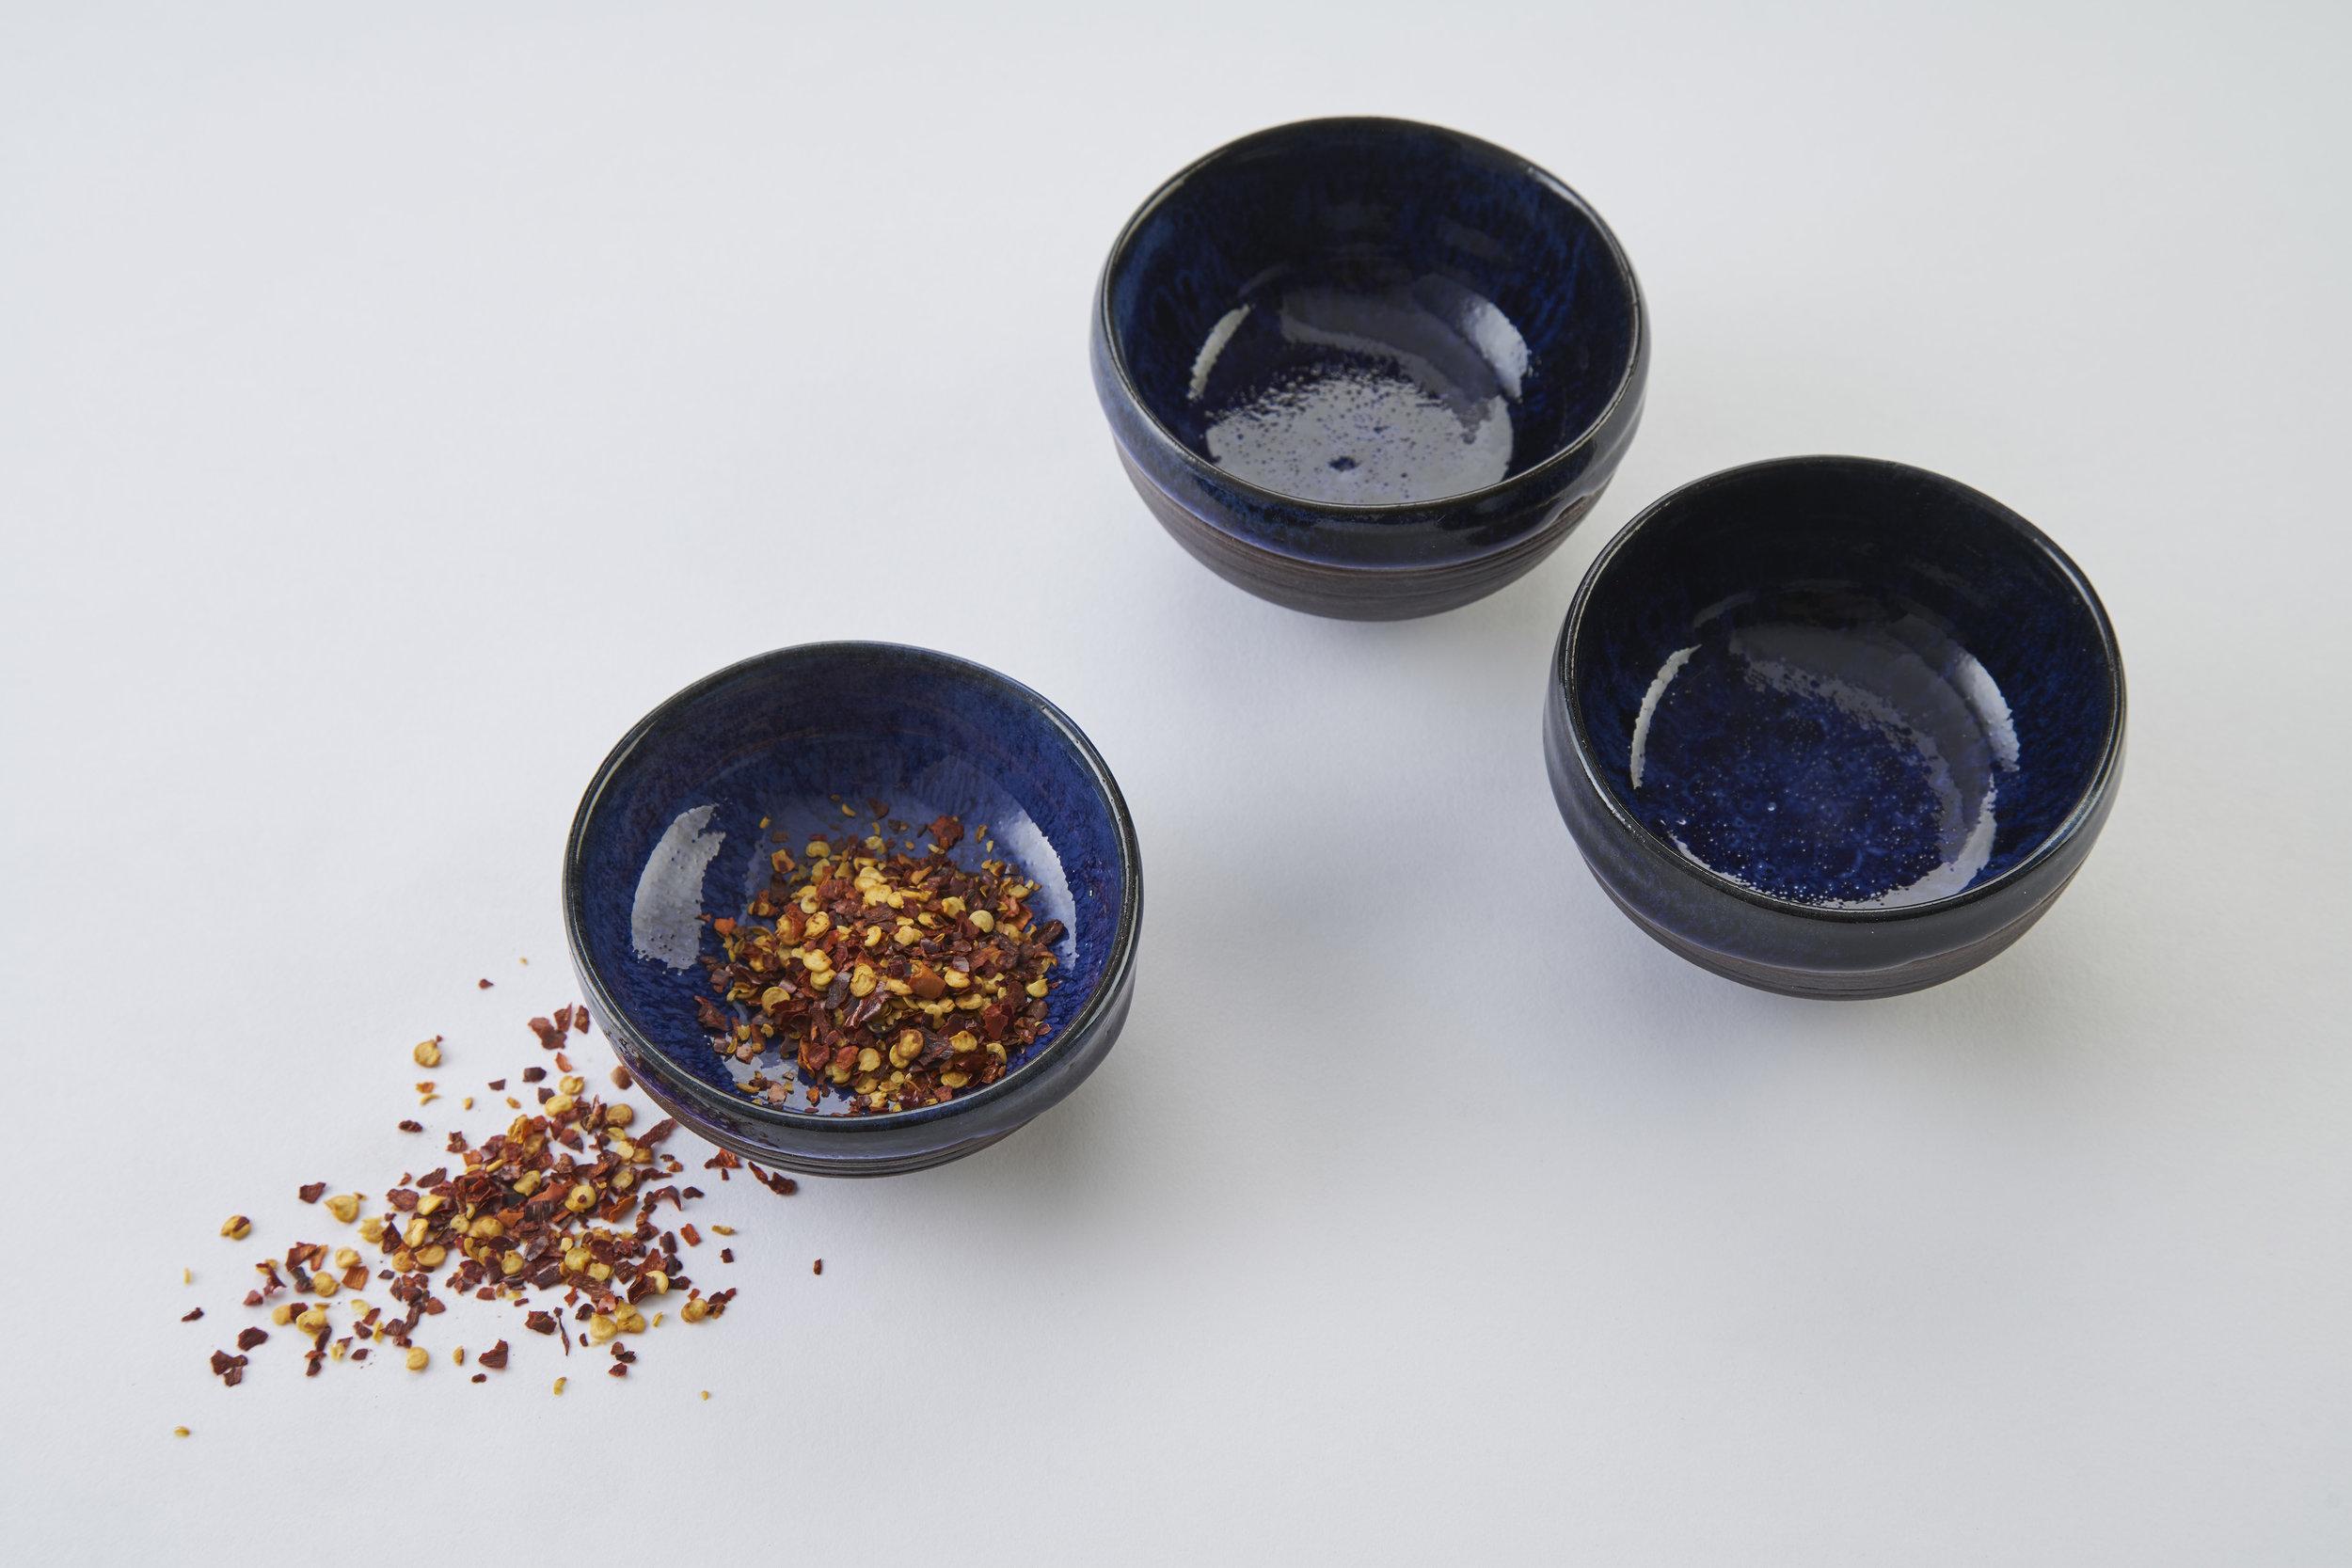 KA Ceramics Black Onyx porcelain salt bowls (7.5cm x 4cm) and chilli bowls (3cm x 7cm) cobalt blue, dolomte and tin layered glaze. Matthew Booth photography 1.jpg